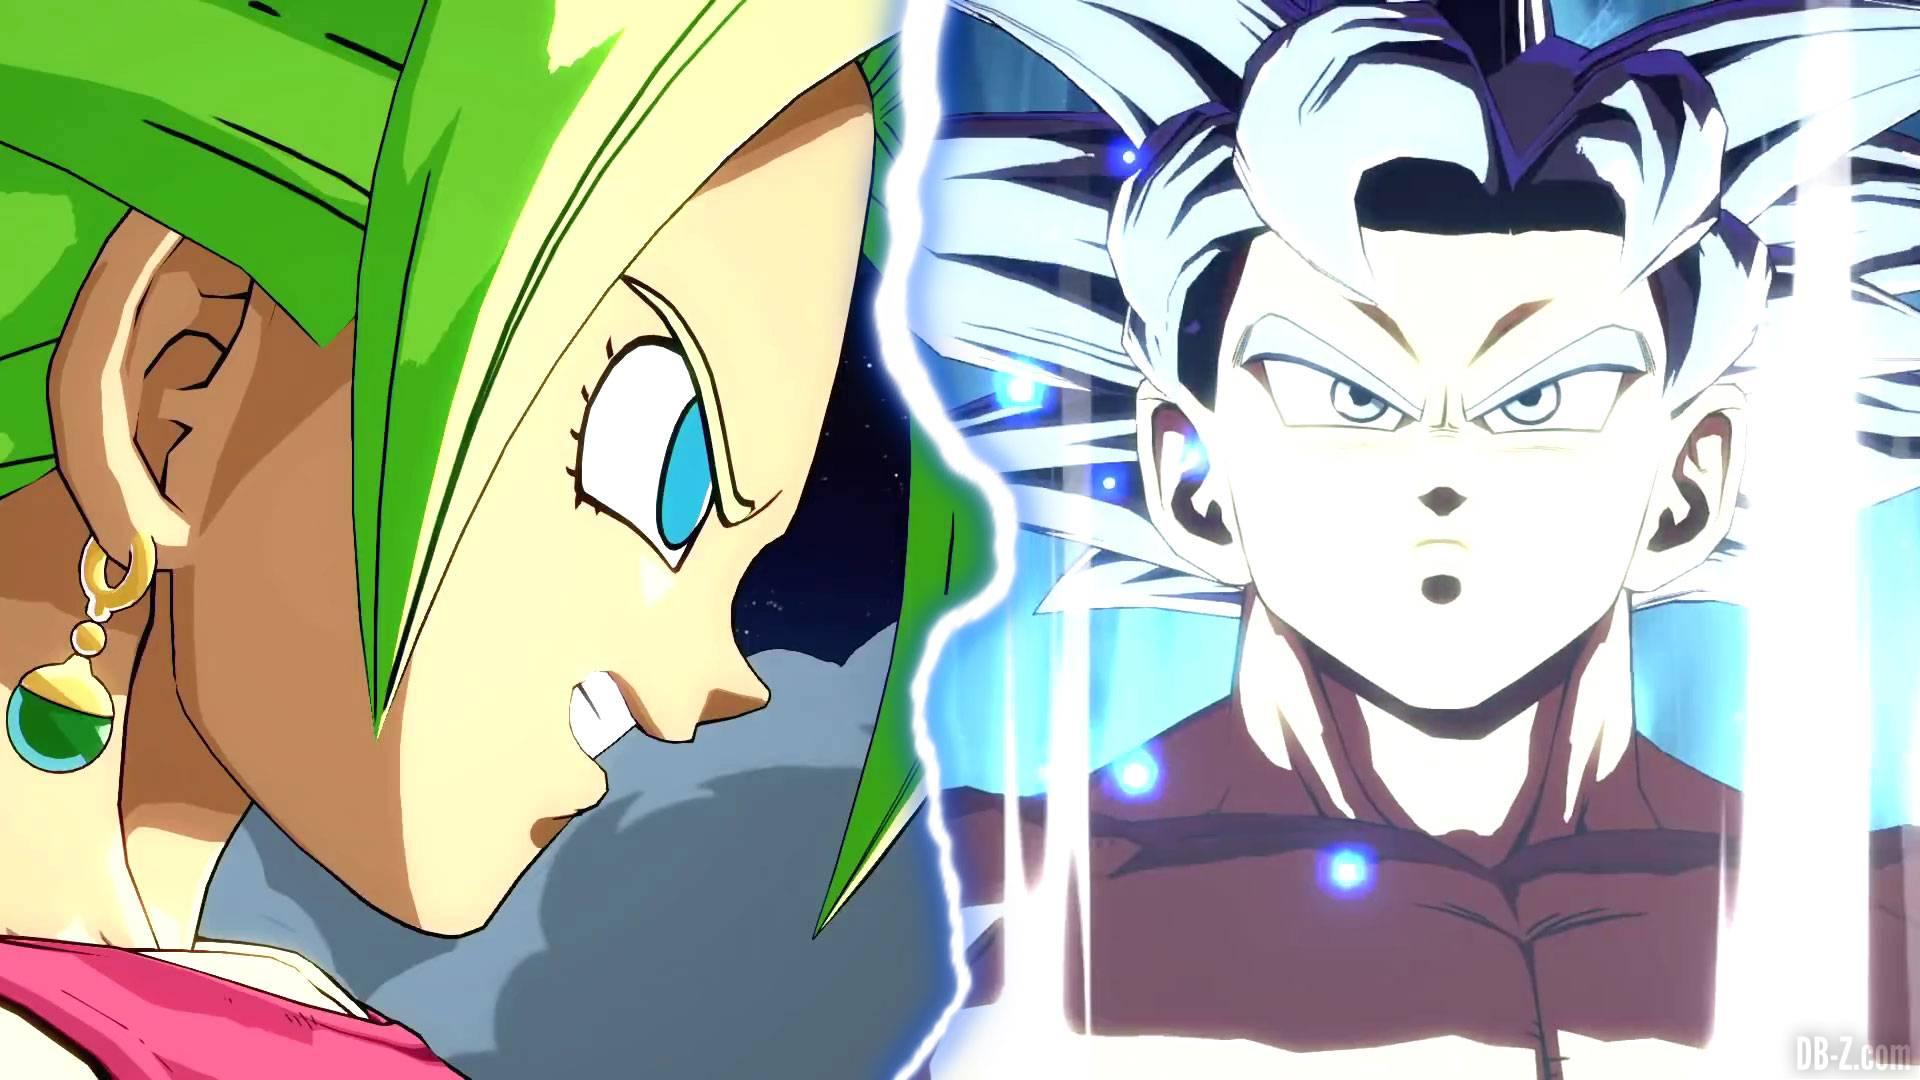 Dragon Ball Fighterz Les Images Hd De Kefla Et Goku Ultra Instinct